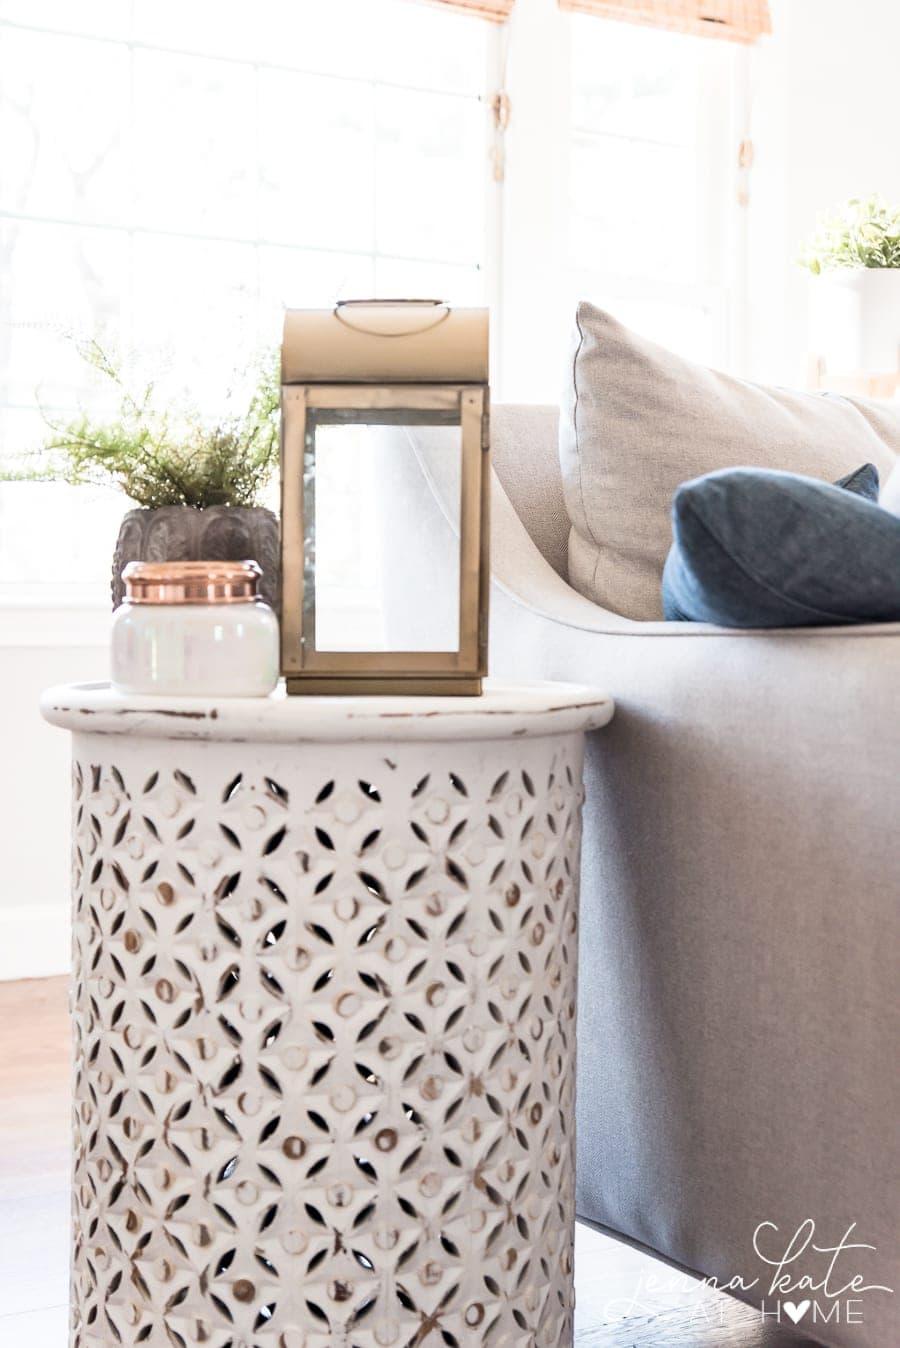 Cozy winter home decor ideas and tips